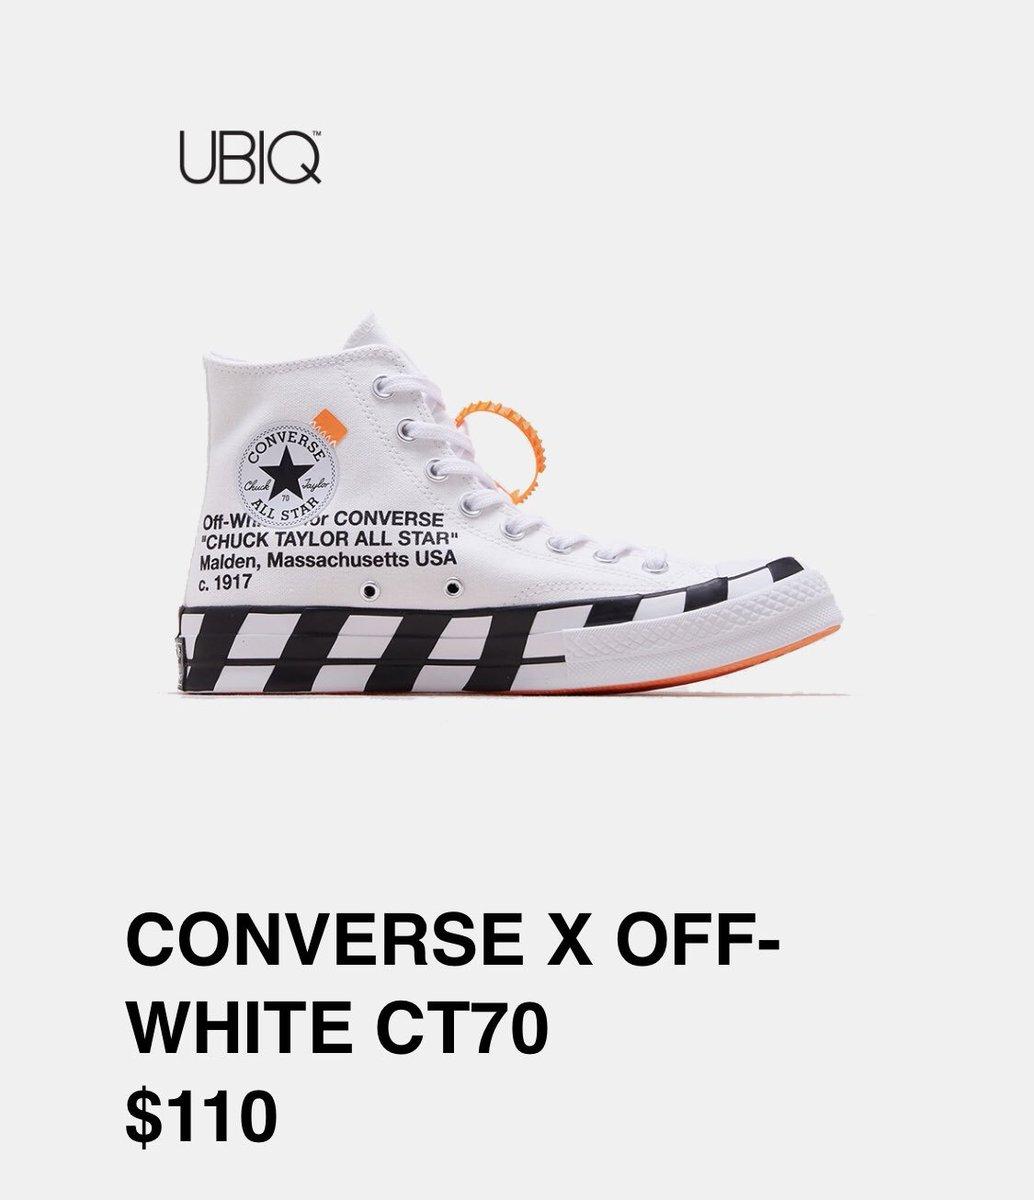 OFF WHITE x Converse Chuck 70 Online Links & Raffles